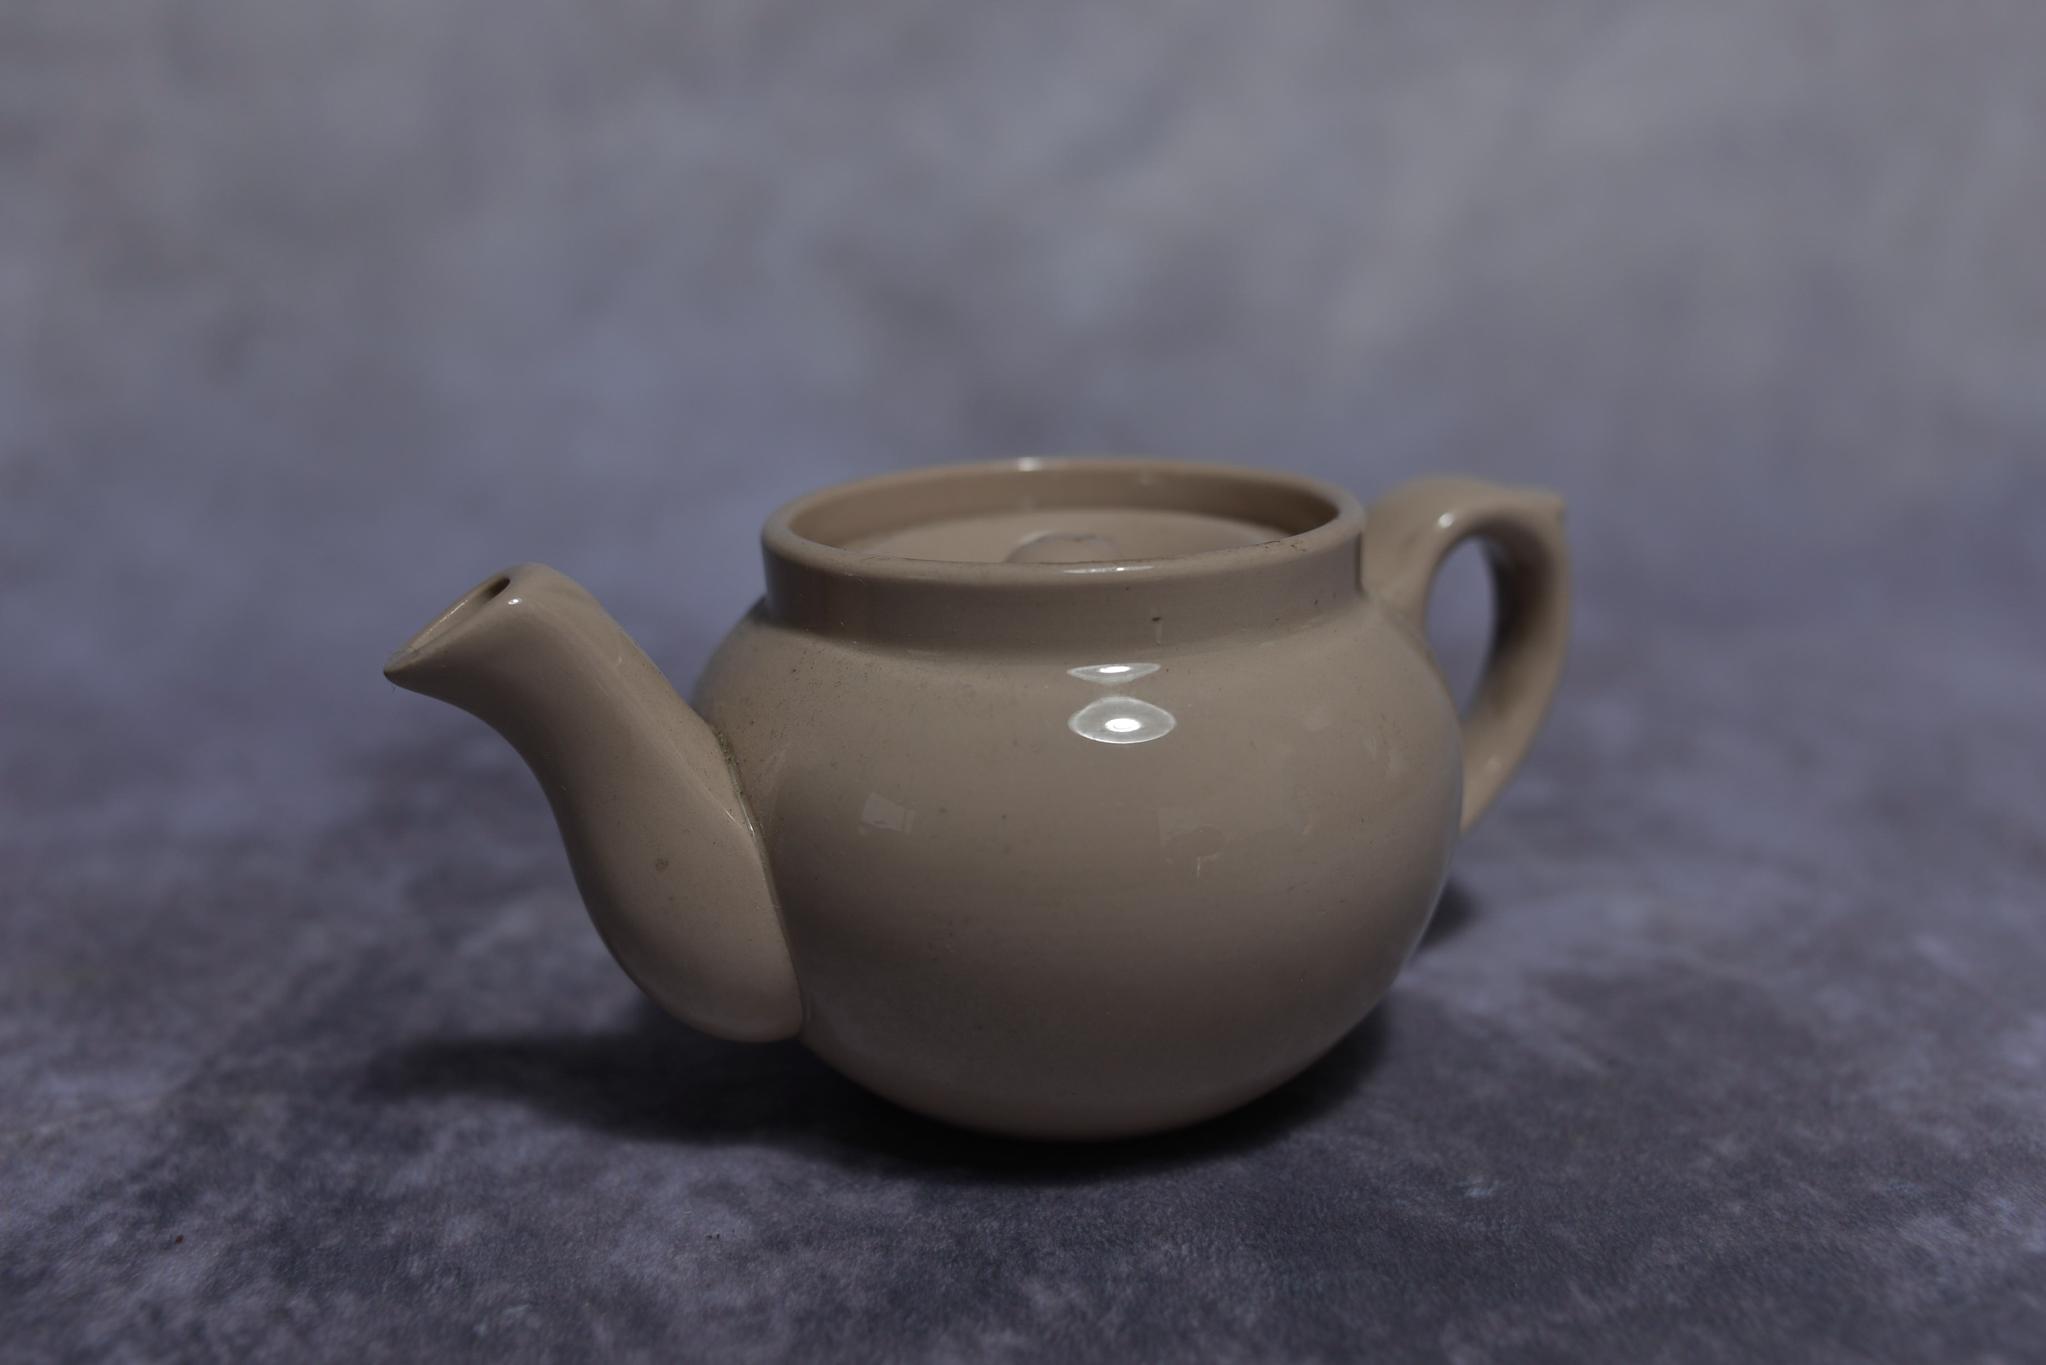 Lot 38 - Vintage British Rail teapot